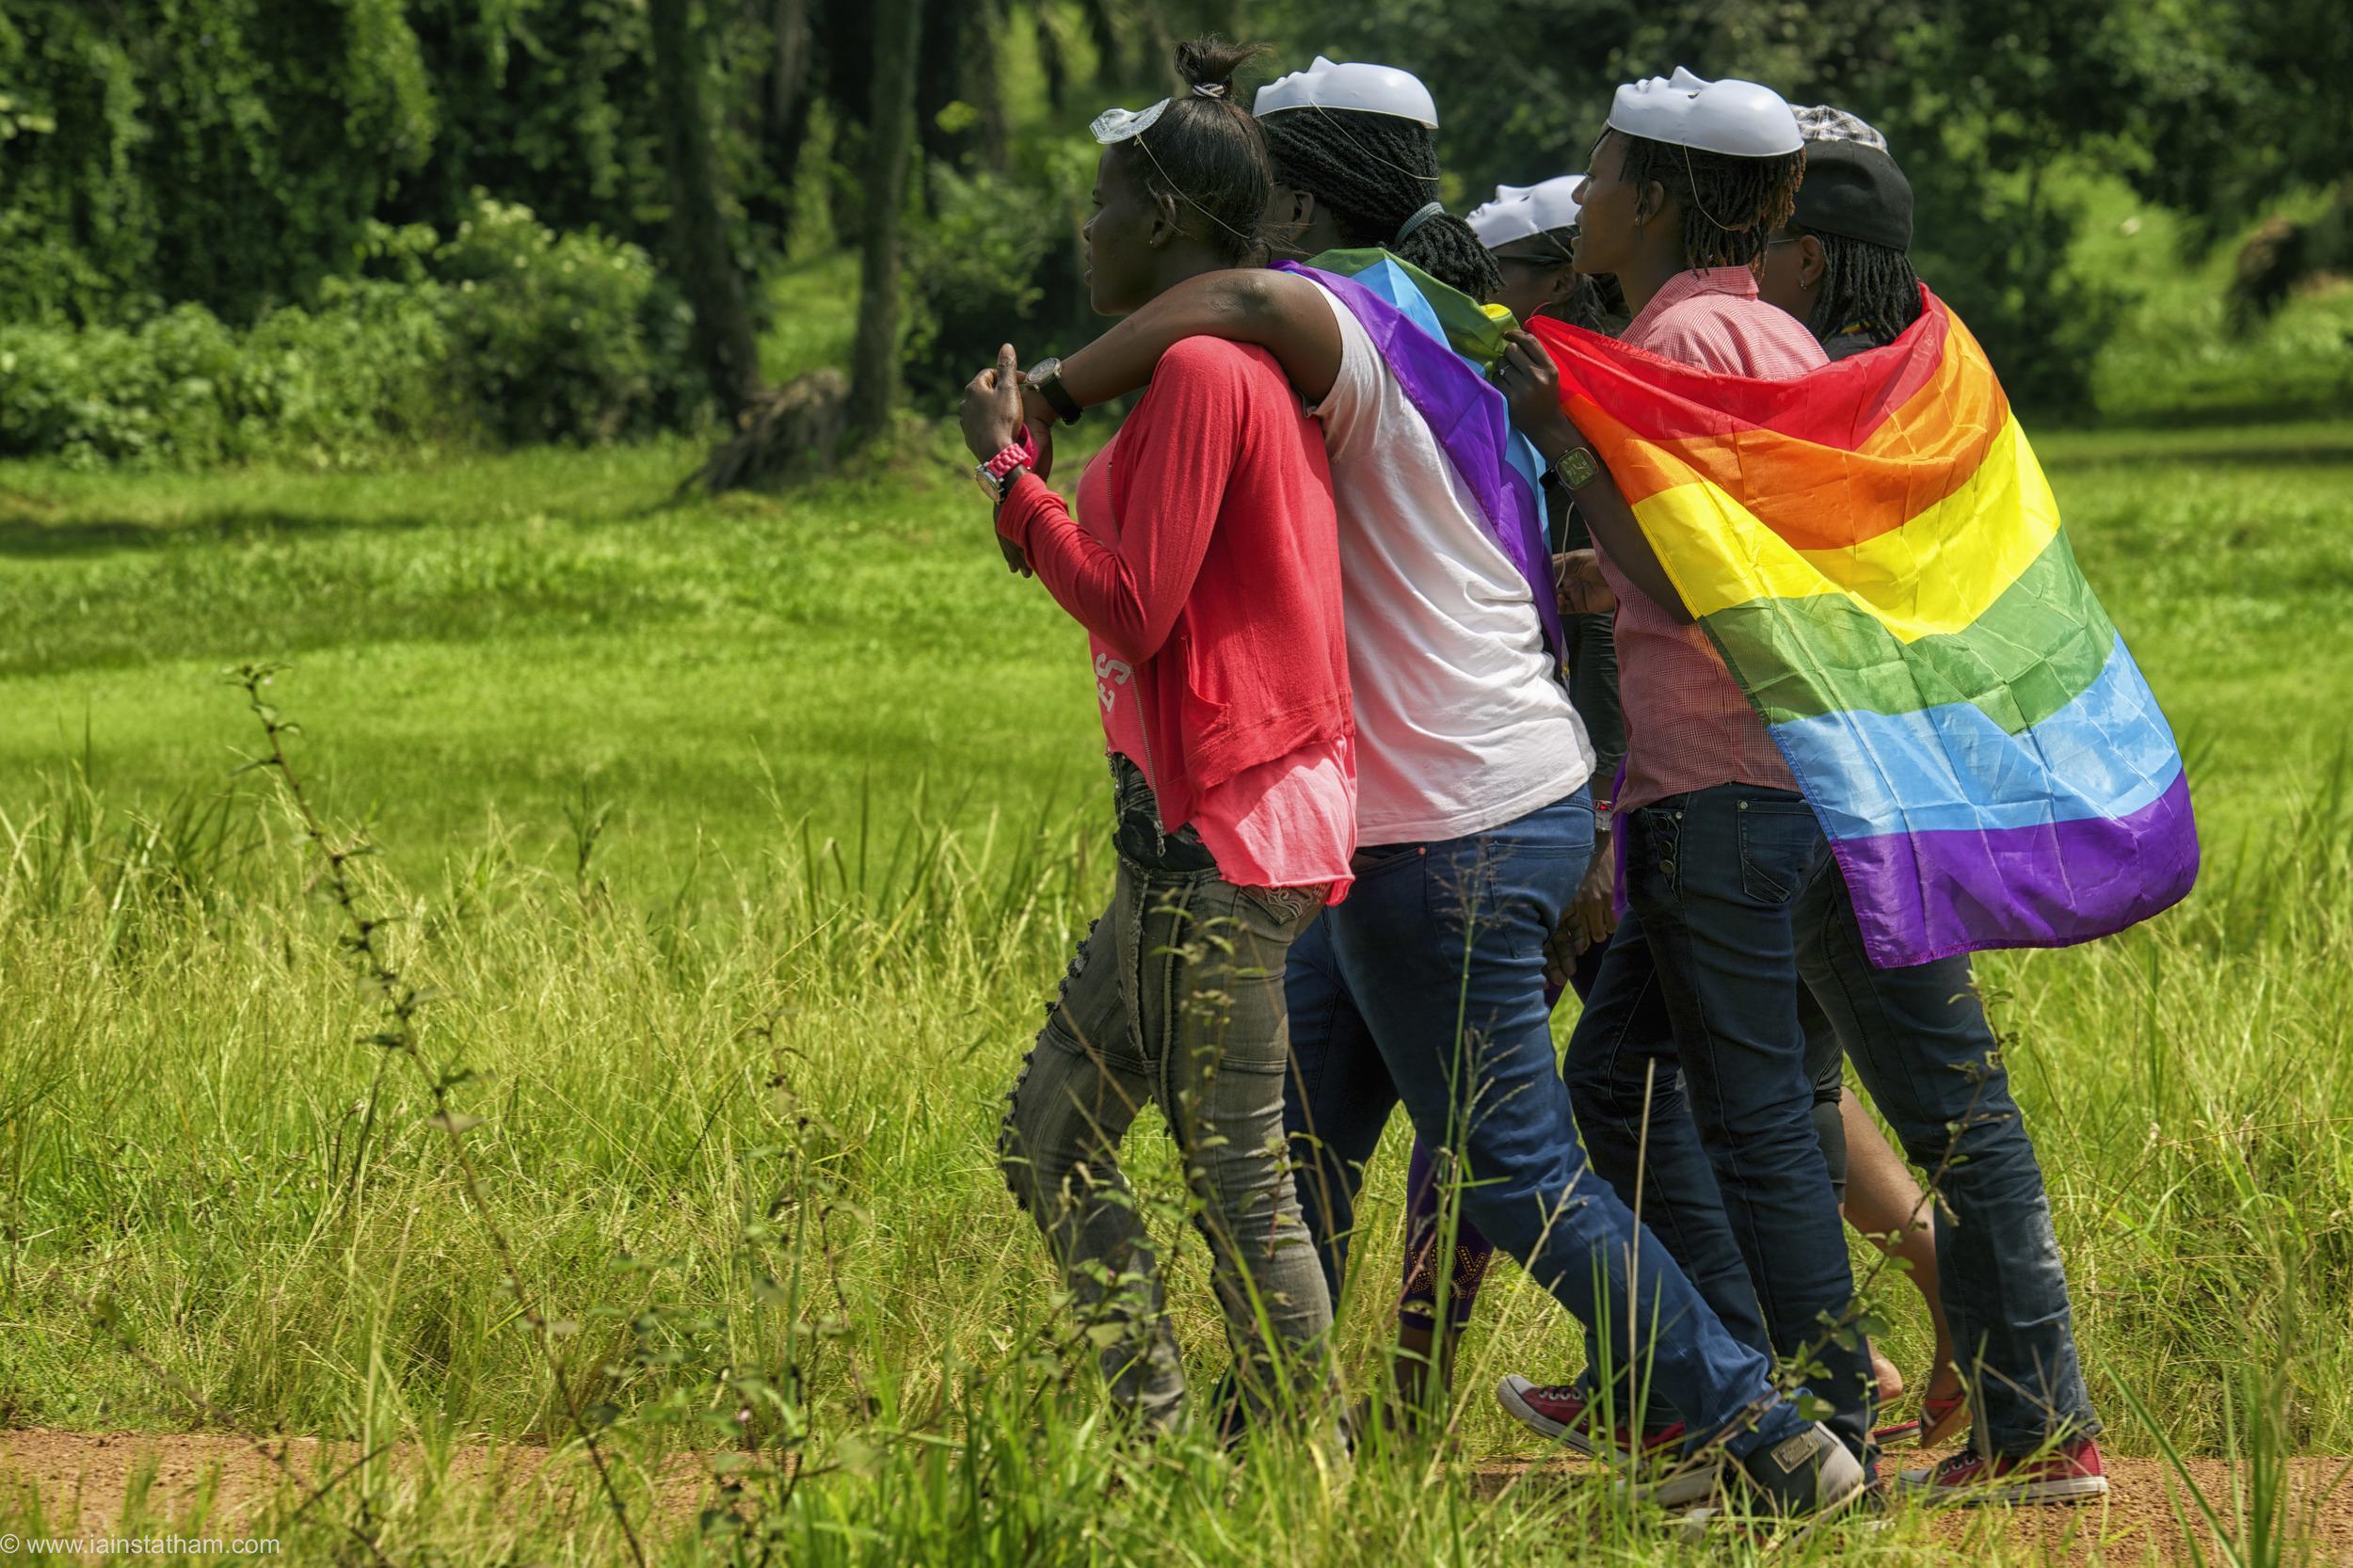 ug - entebbe - pride - colour-27.jpg